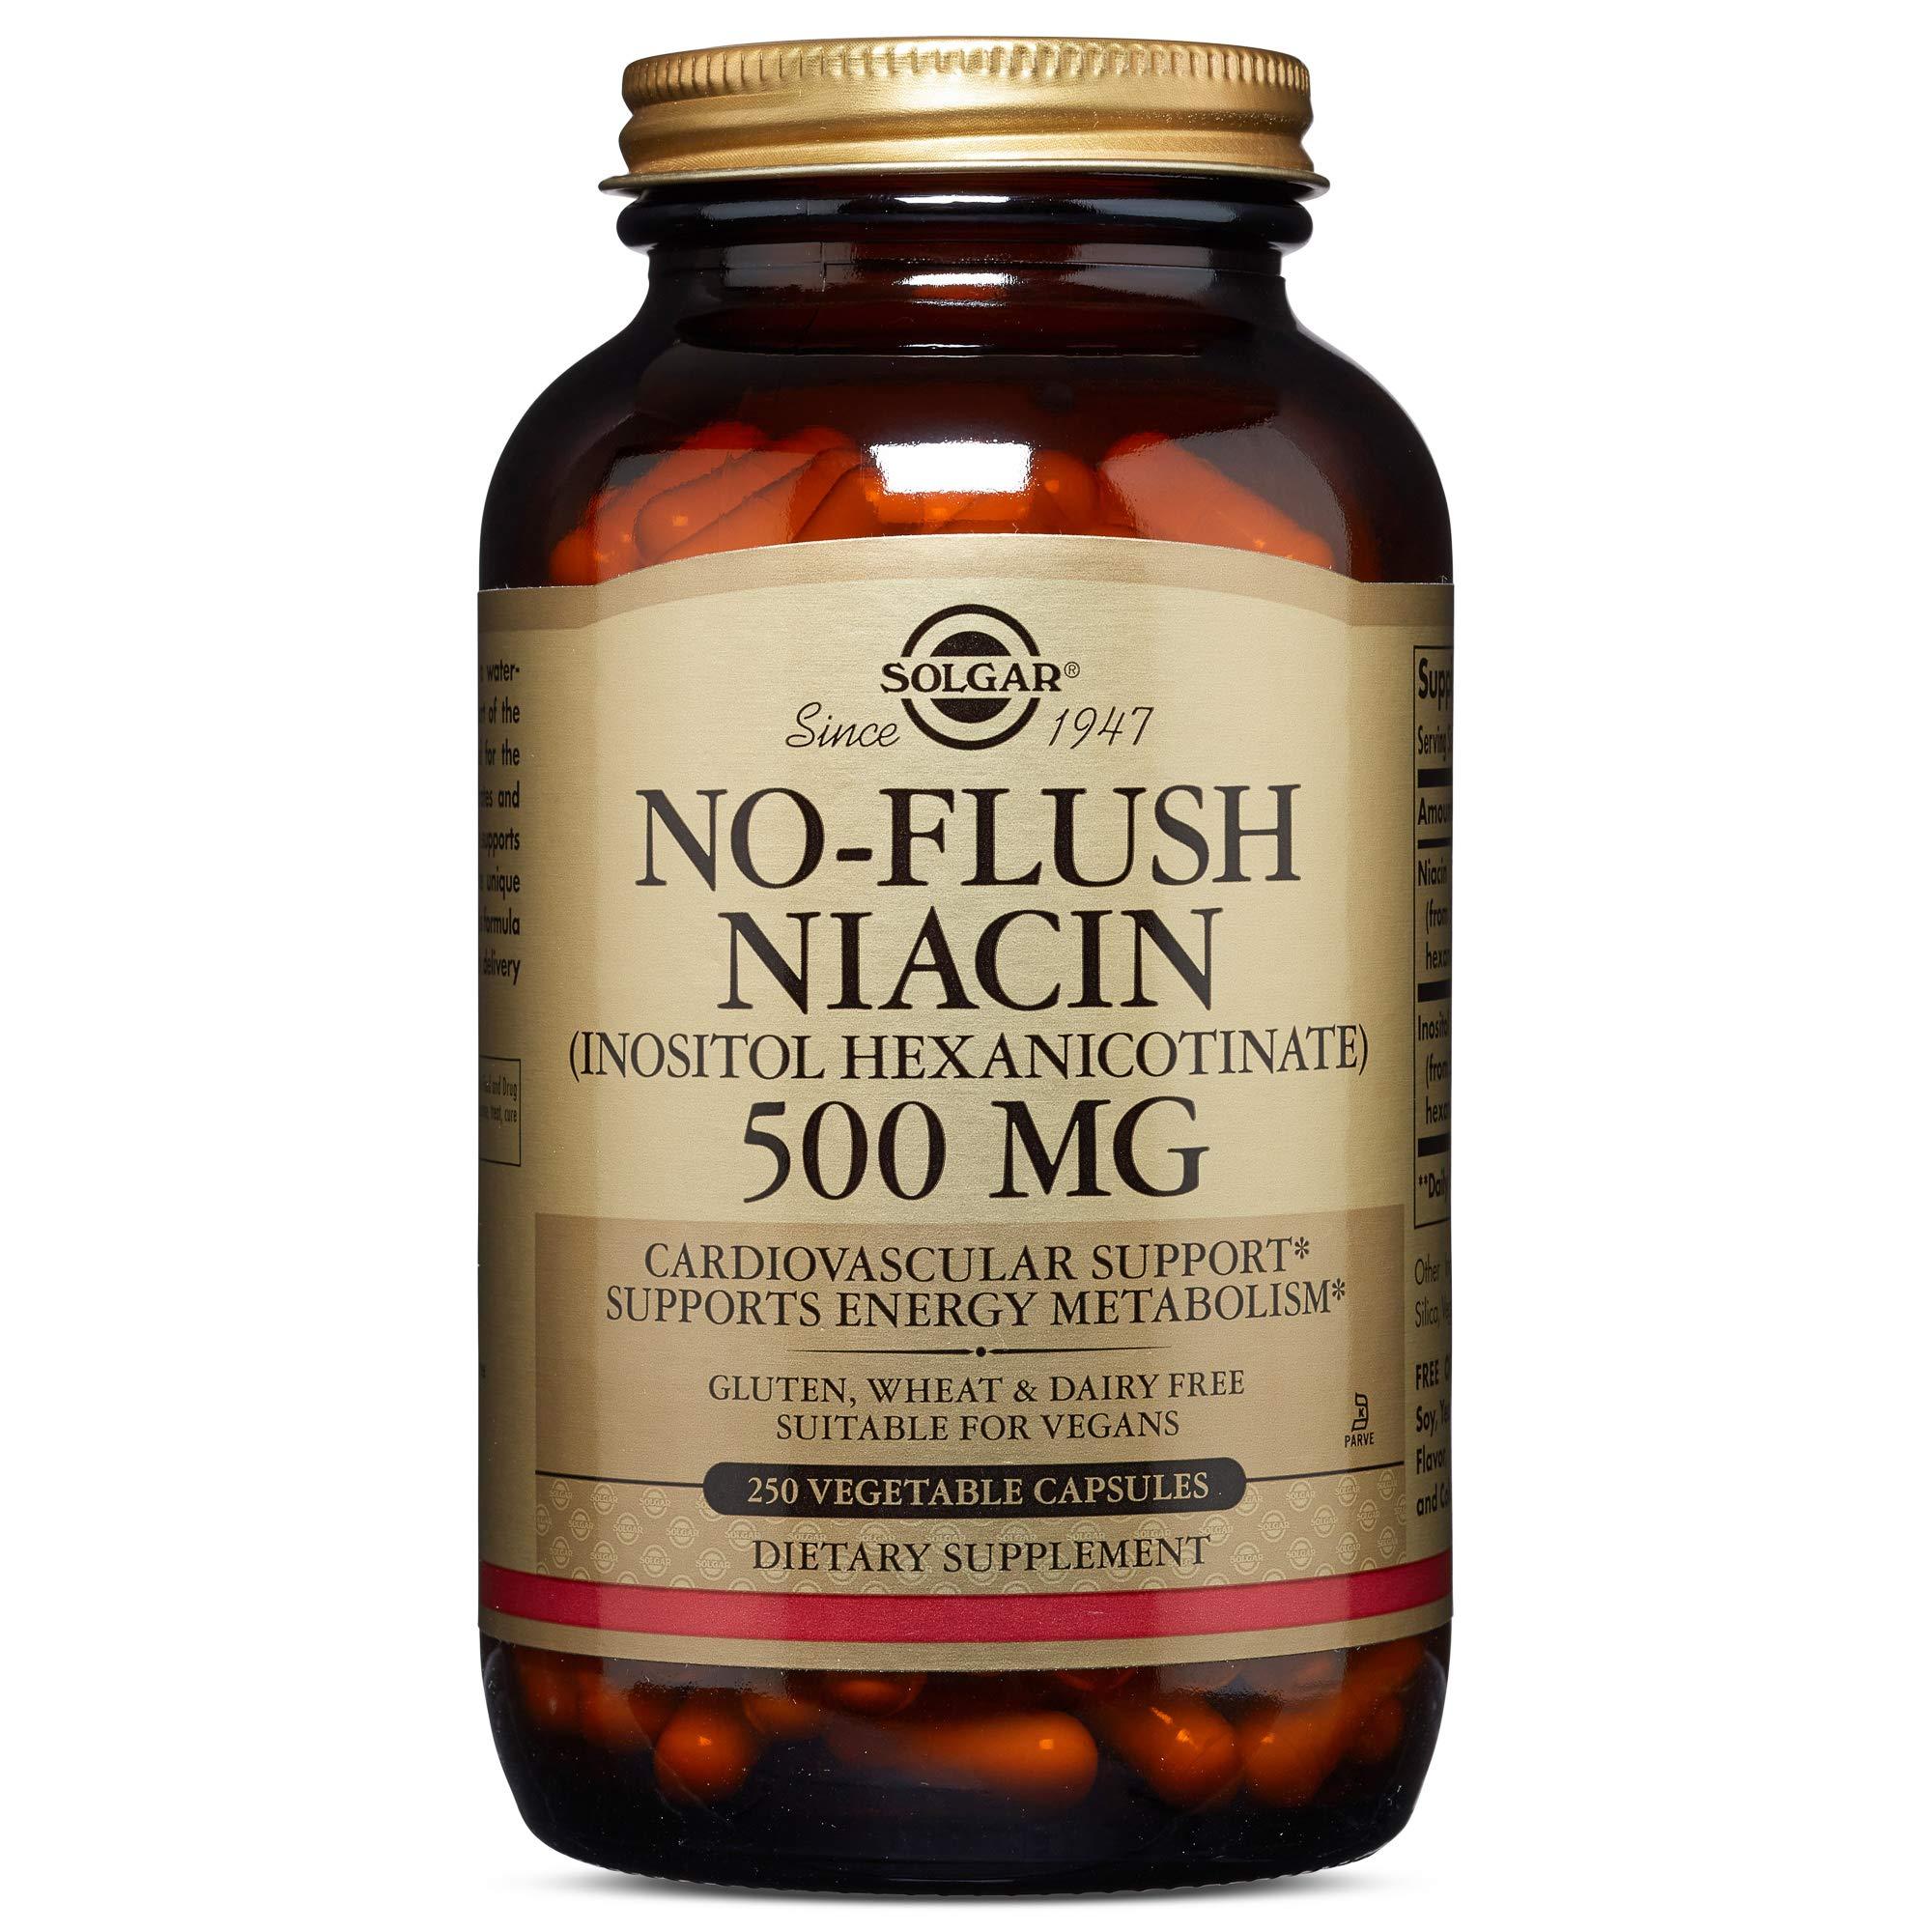 Solgar - No-Flush Niacin (Vitamin B3)(Inositol Hexanicotinate) 500 mg, 250 Vegetable Capsules